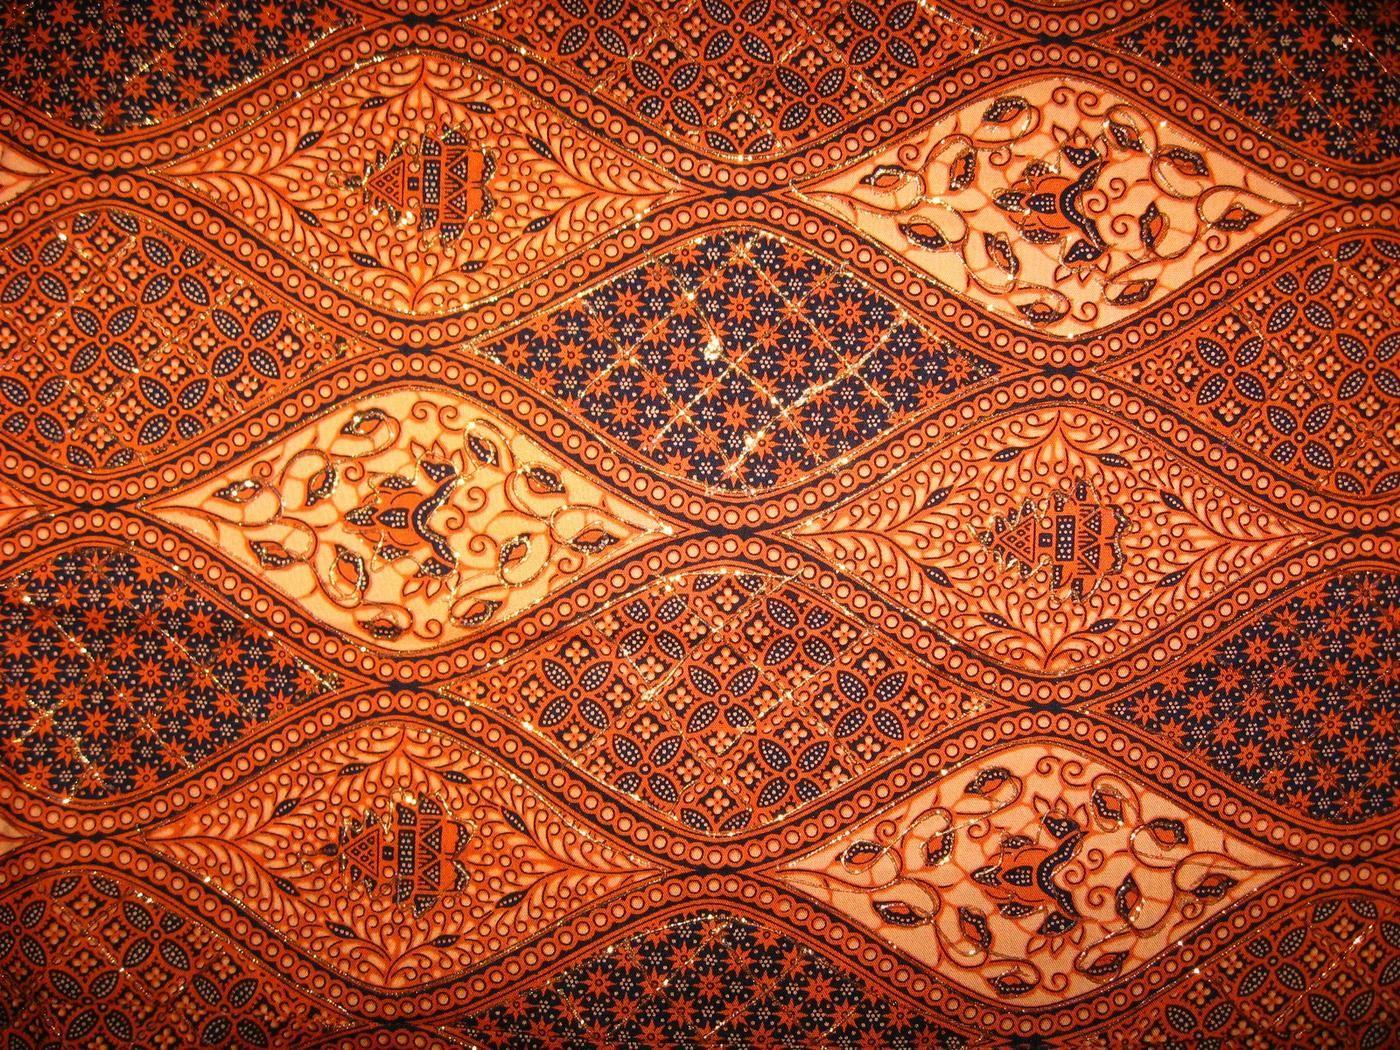 Batik Solo  Baju Celana Kain Batik Solo Pekalongan Indonesia